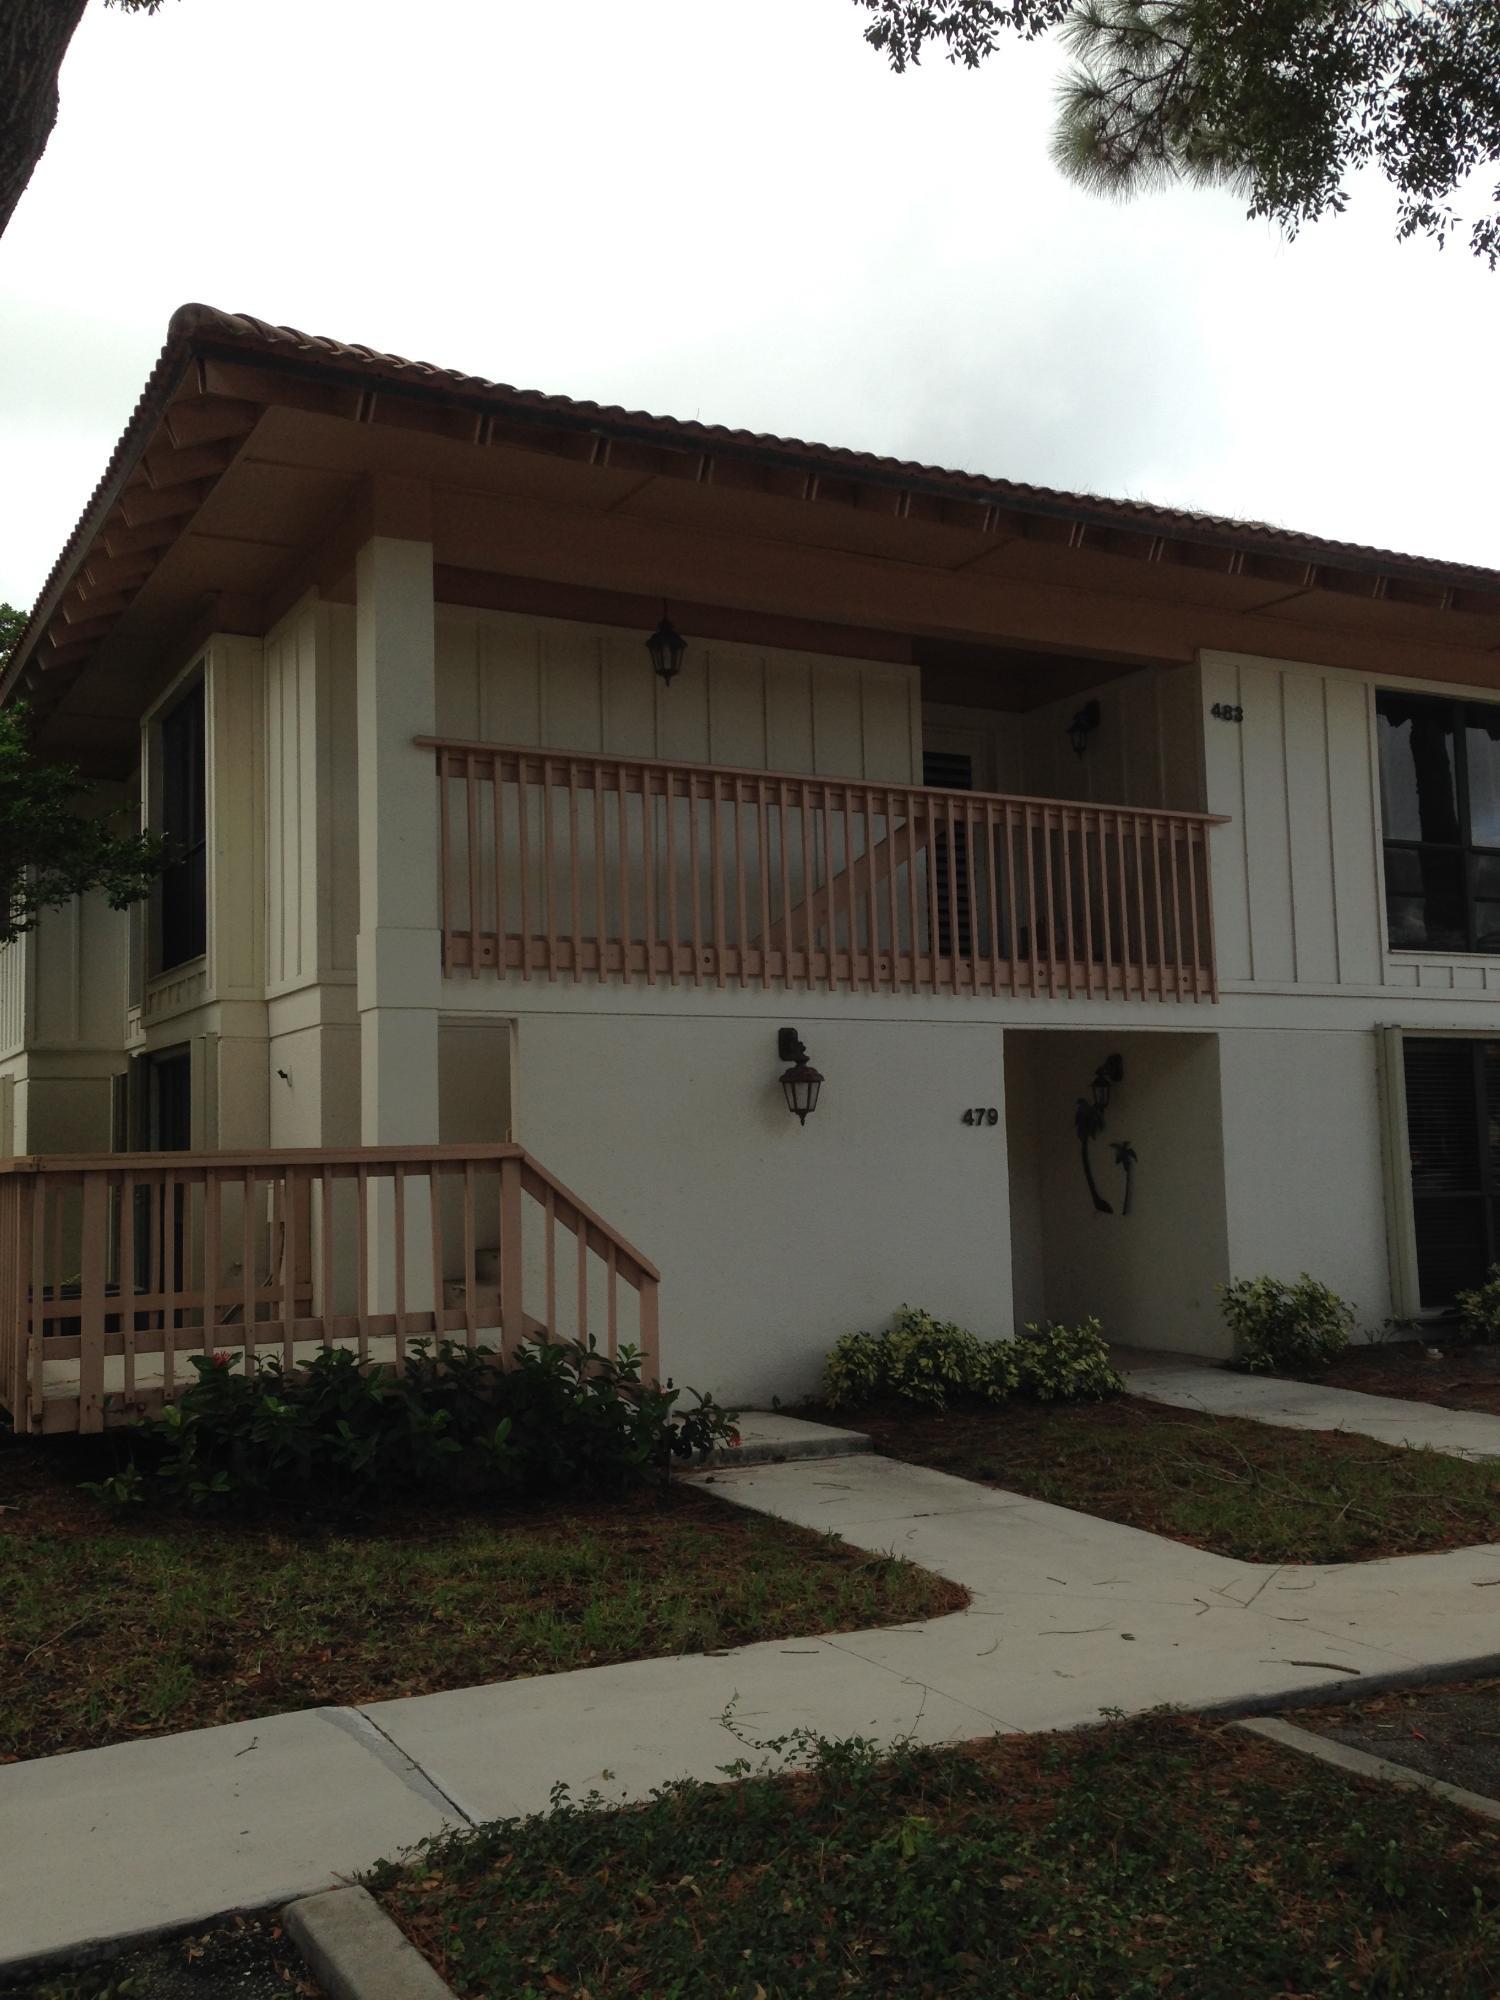 479 Brackenwood Lane 479, Palm Beach Gardens, Florida 33418, 2 Bedrooms Bedrooms, ,2 BathroomsBathrooms,F,Condominium,Brackenwood,RX-10450485